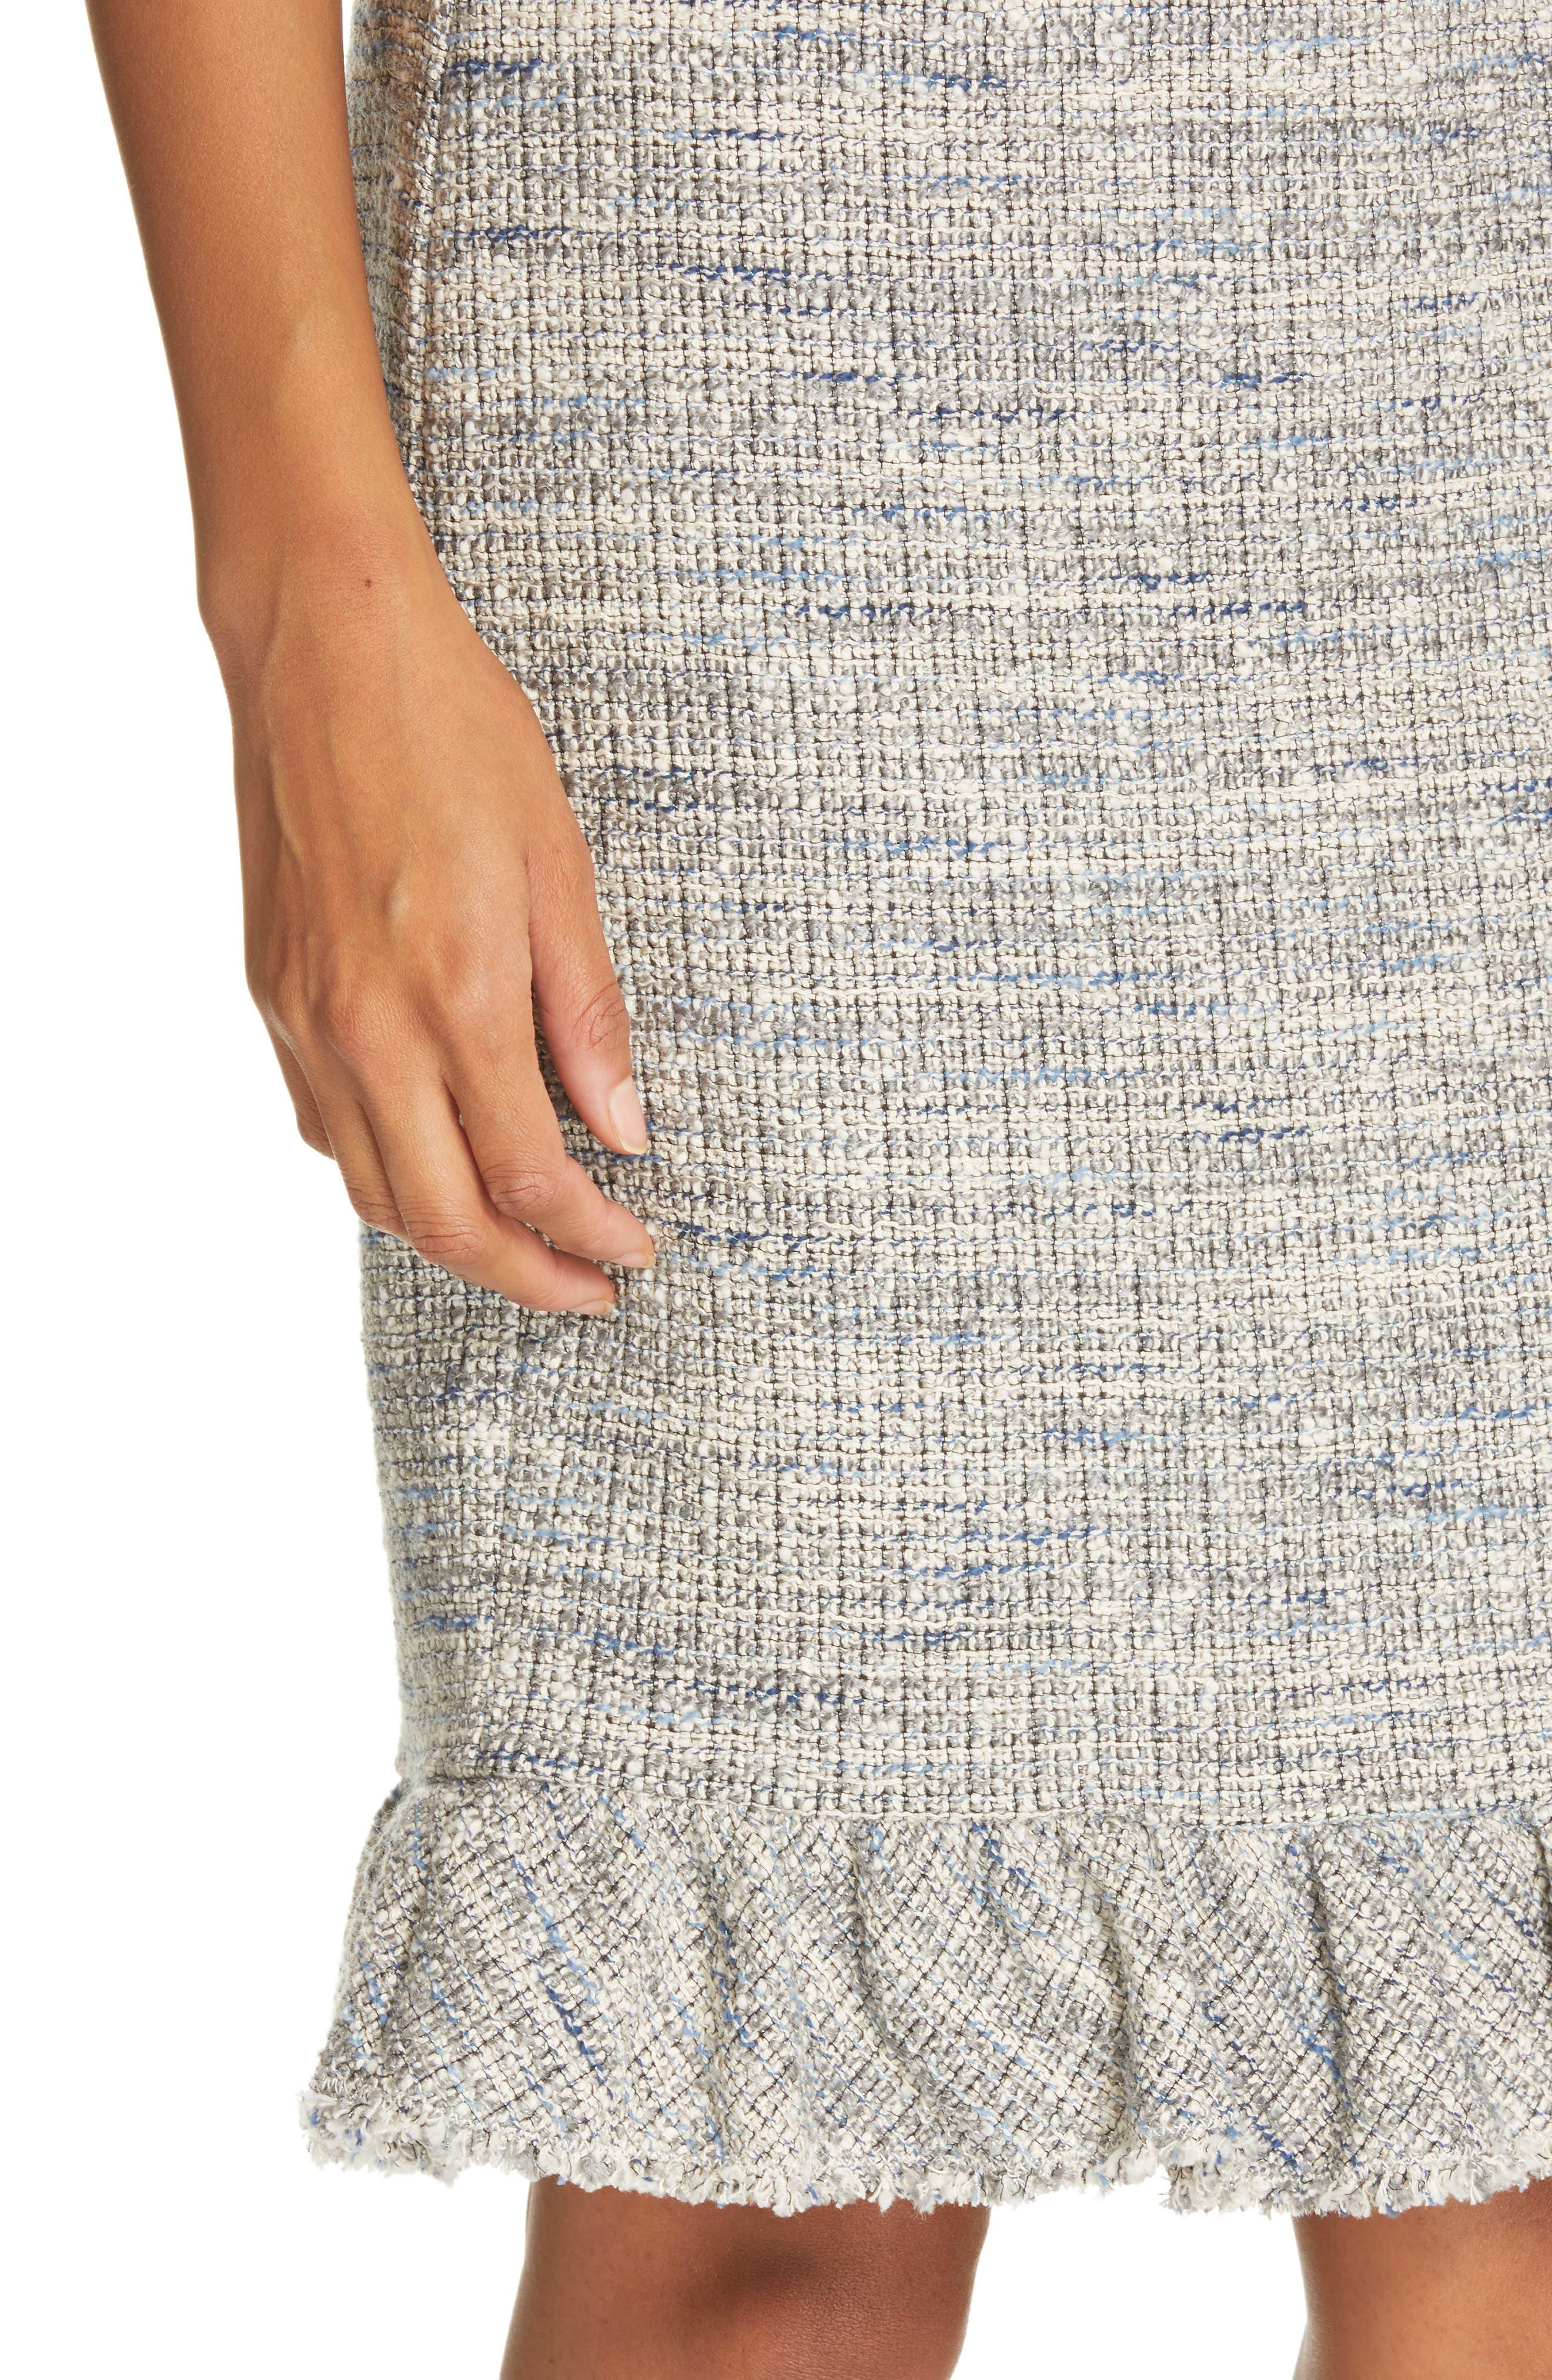 REBECCA TAYLOR, Tweed Ruffle Hem Skirt, Alternate thumbnail 4, color, 020